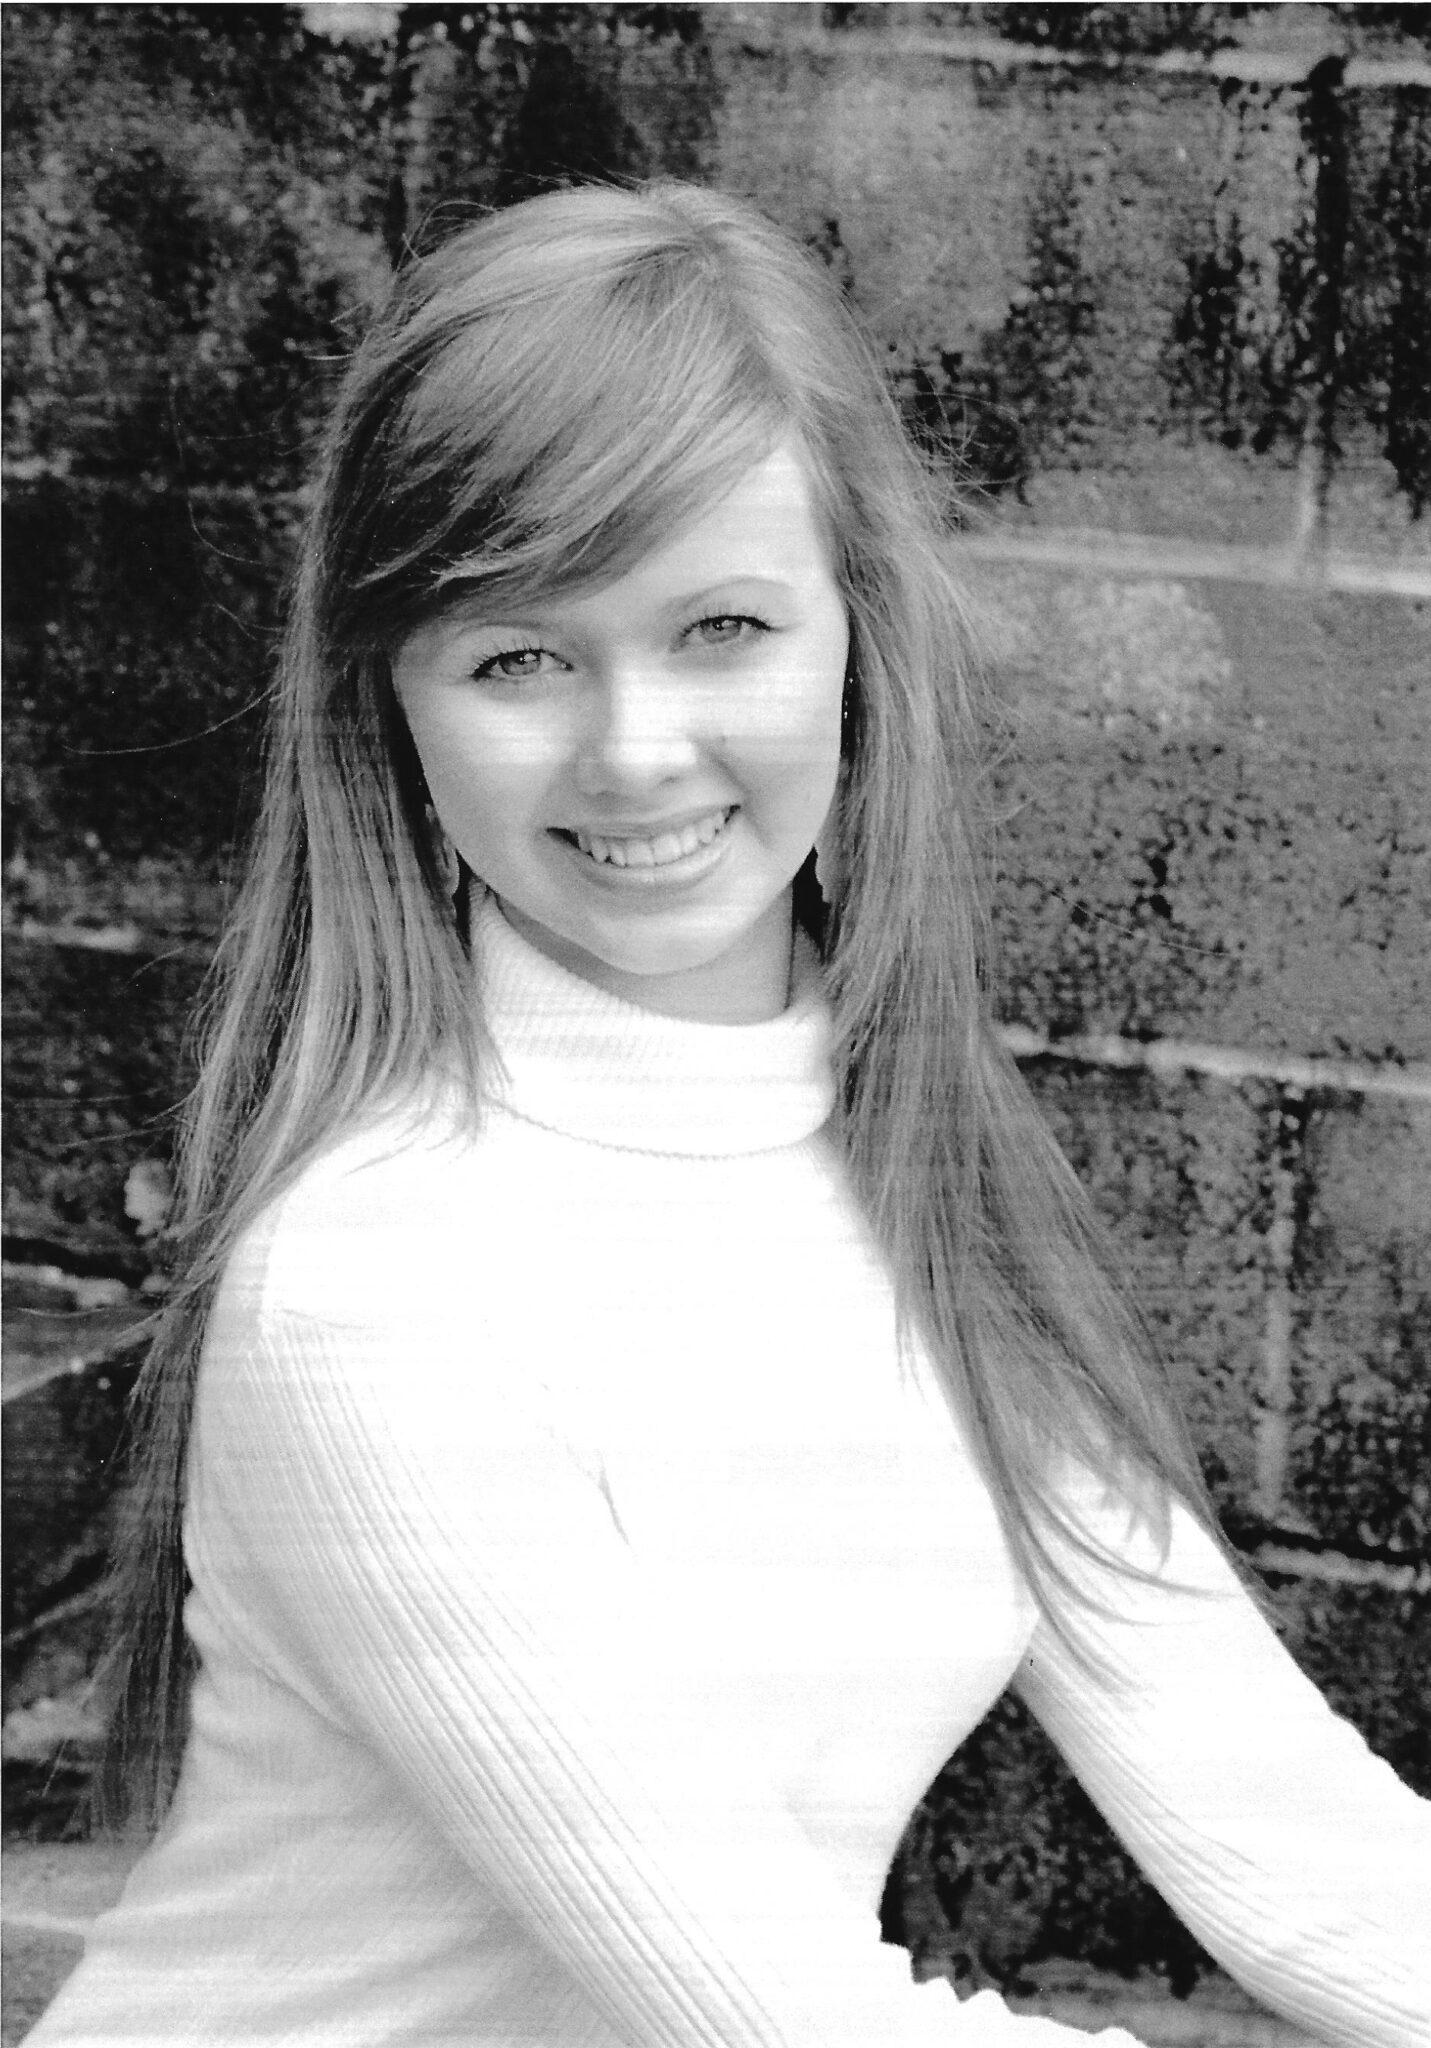 Jennifer Rholoff